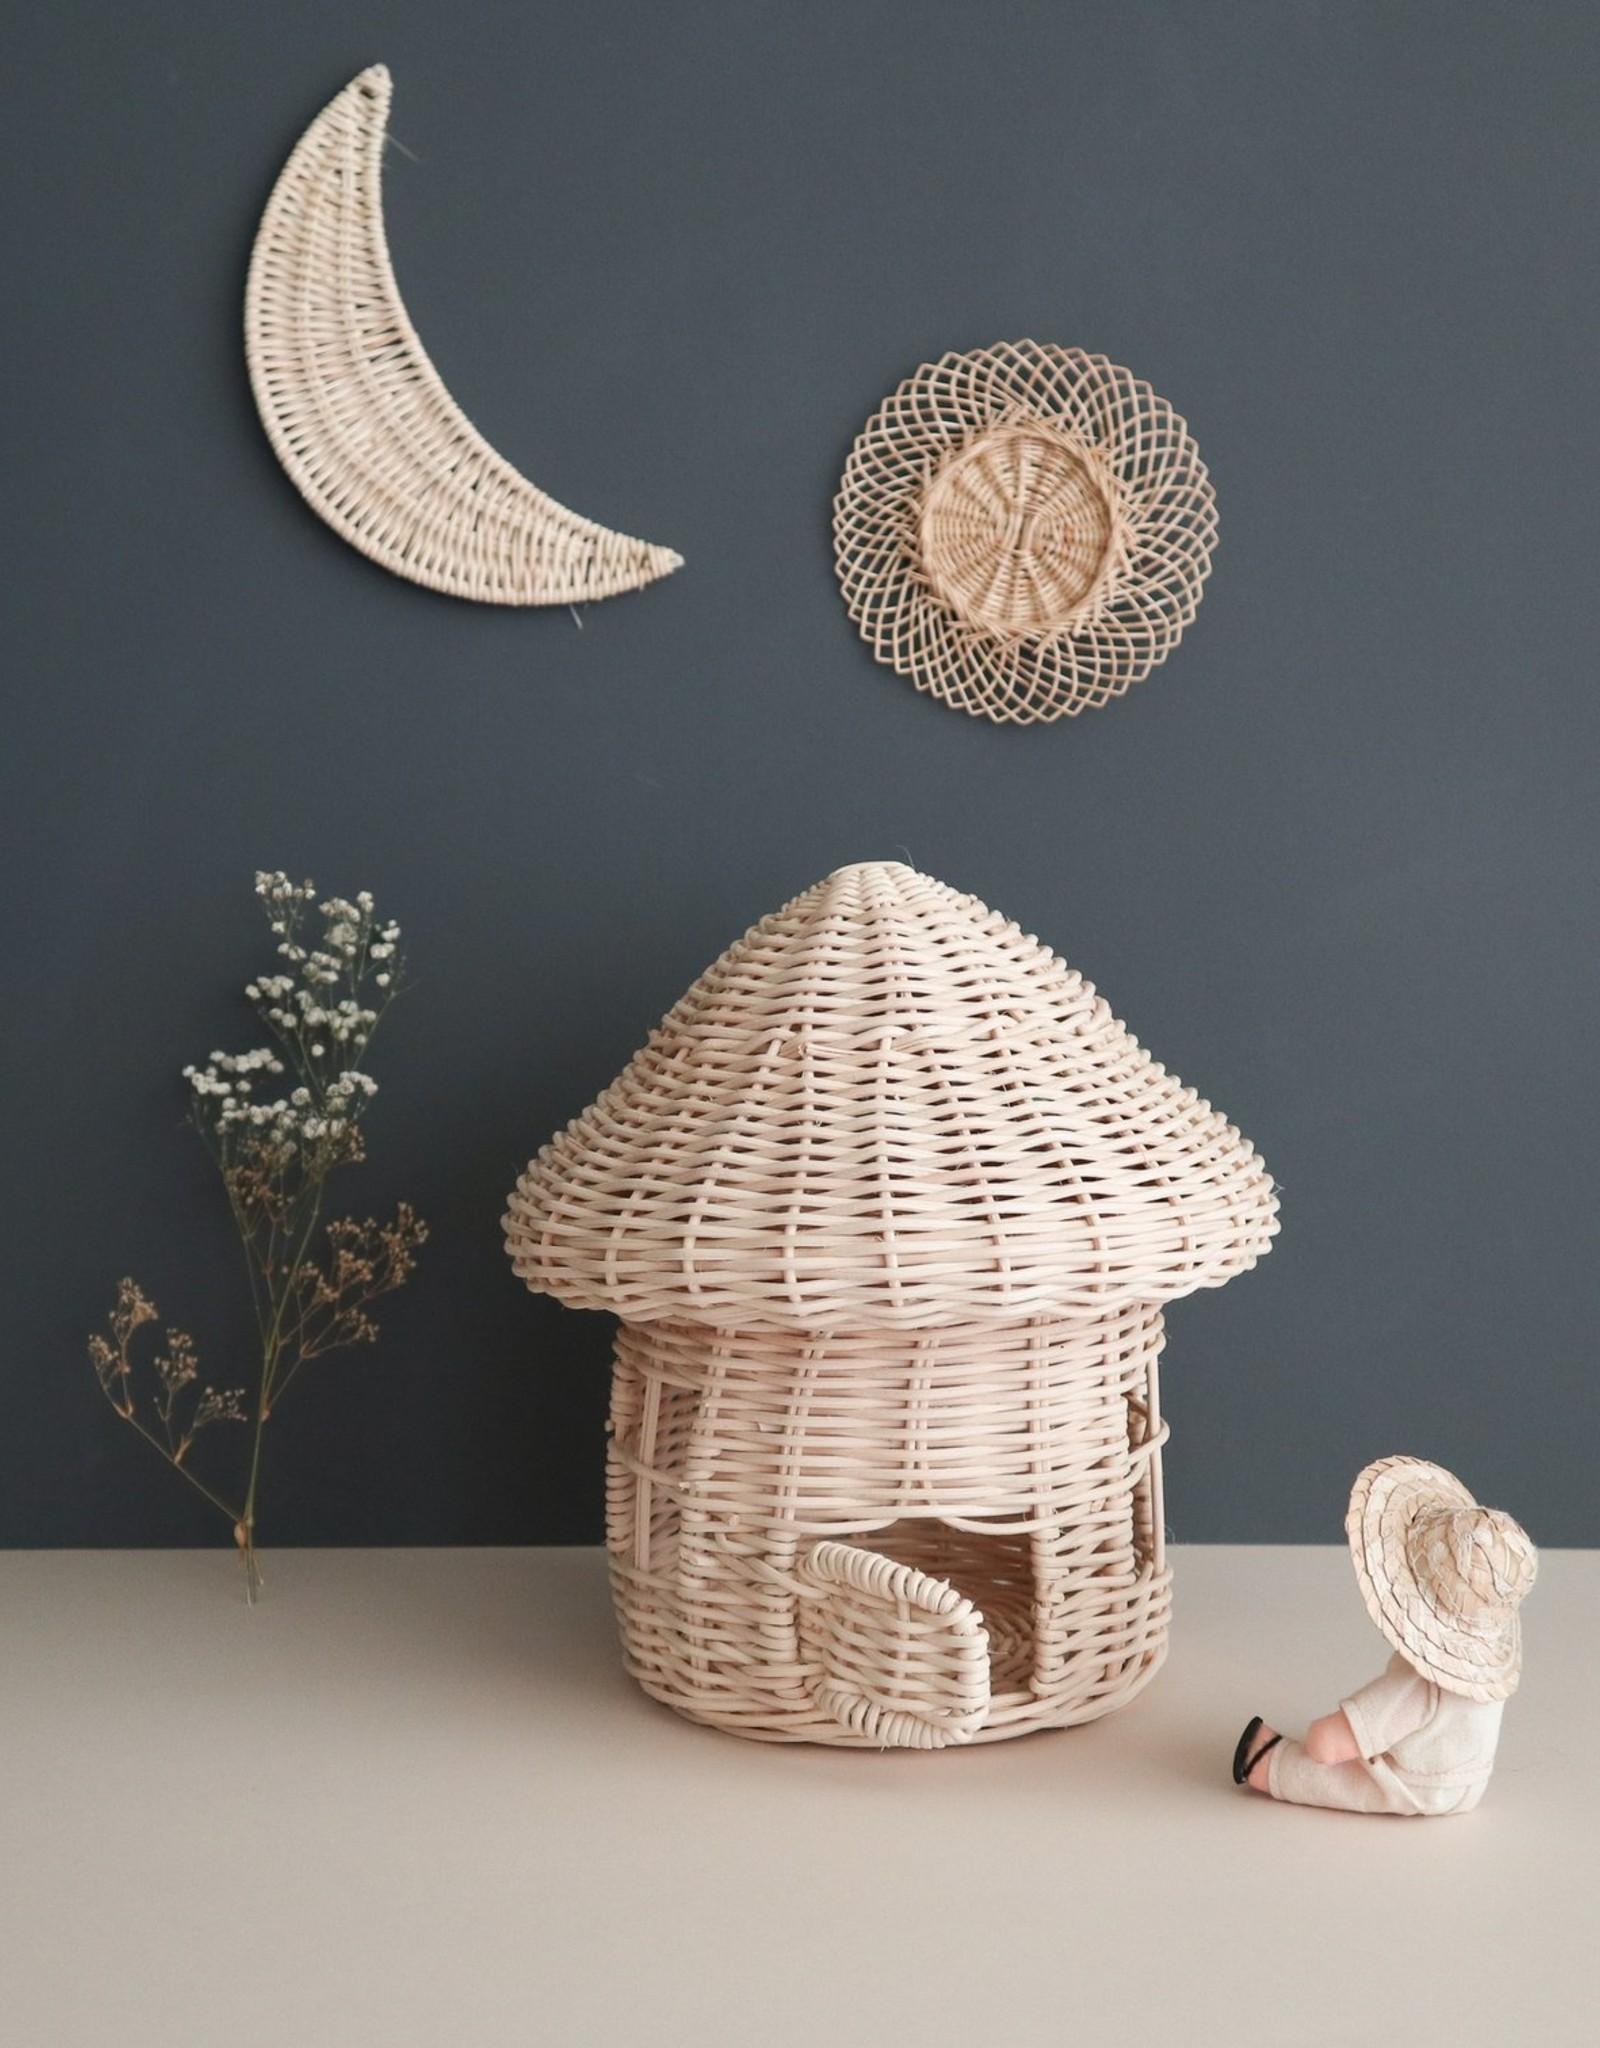 Coconeh Mushroom House